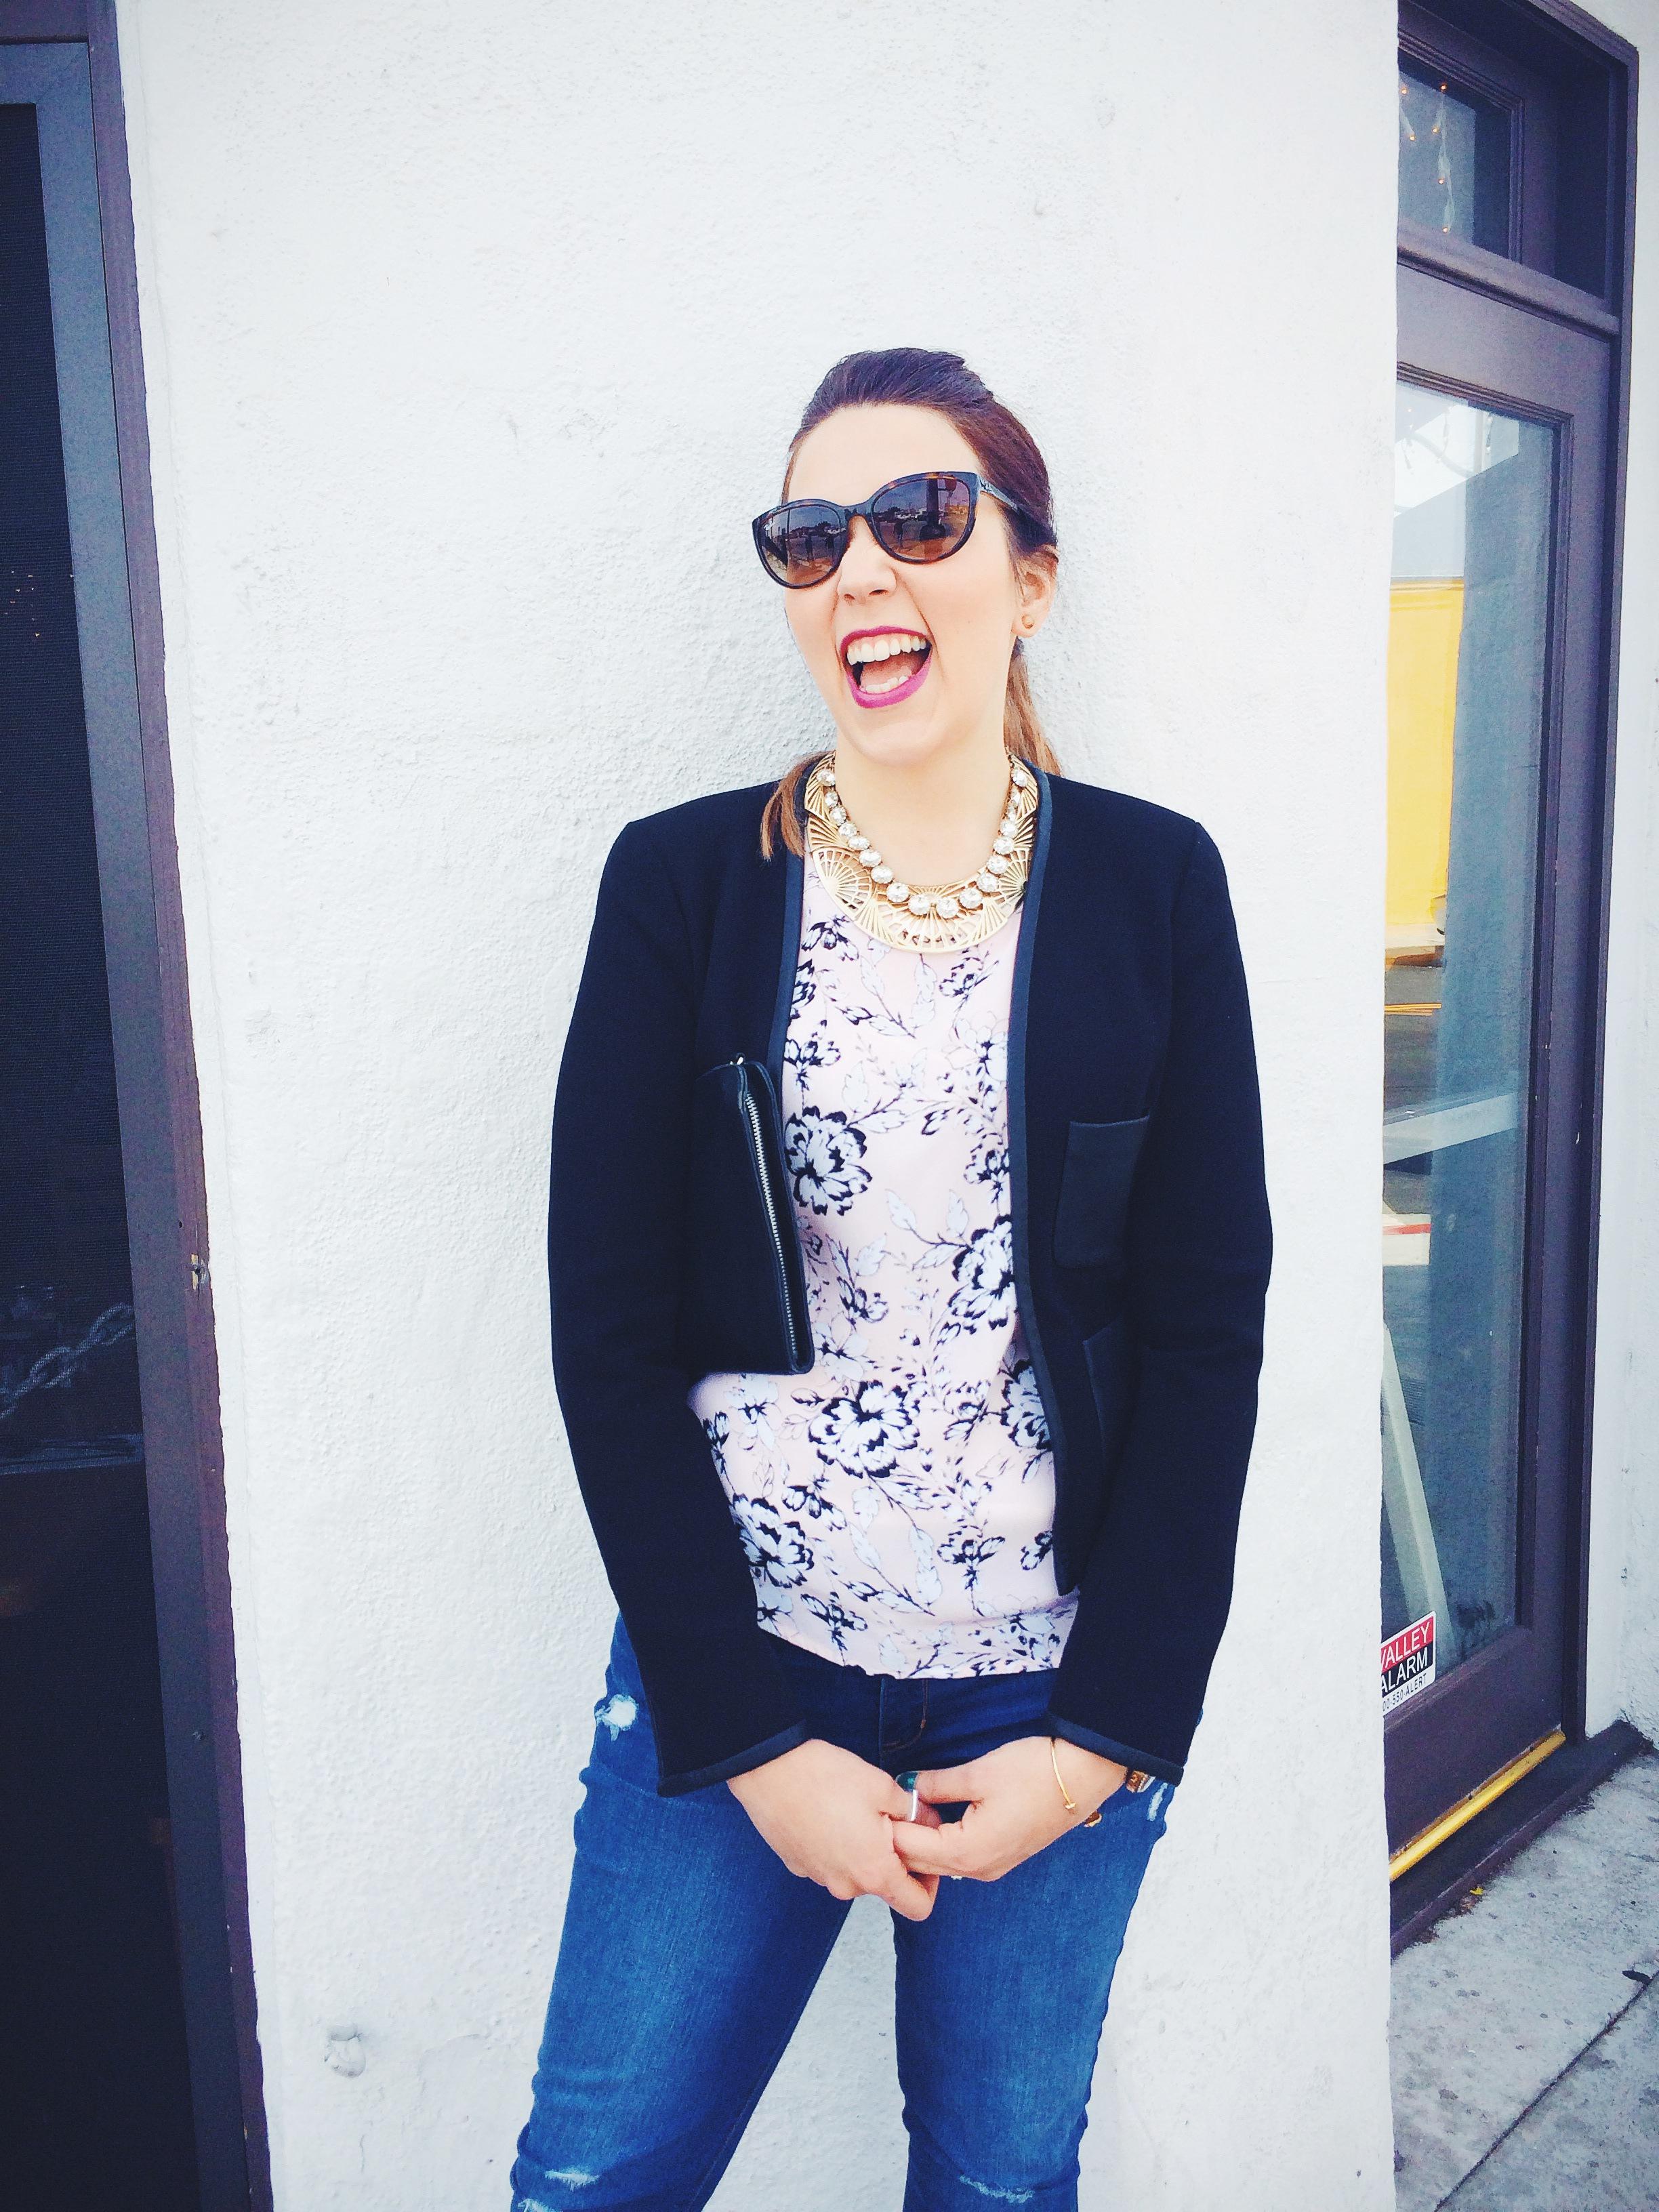 Katie Laughing